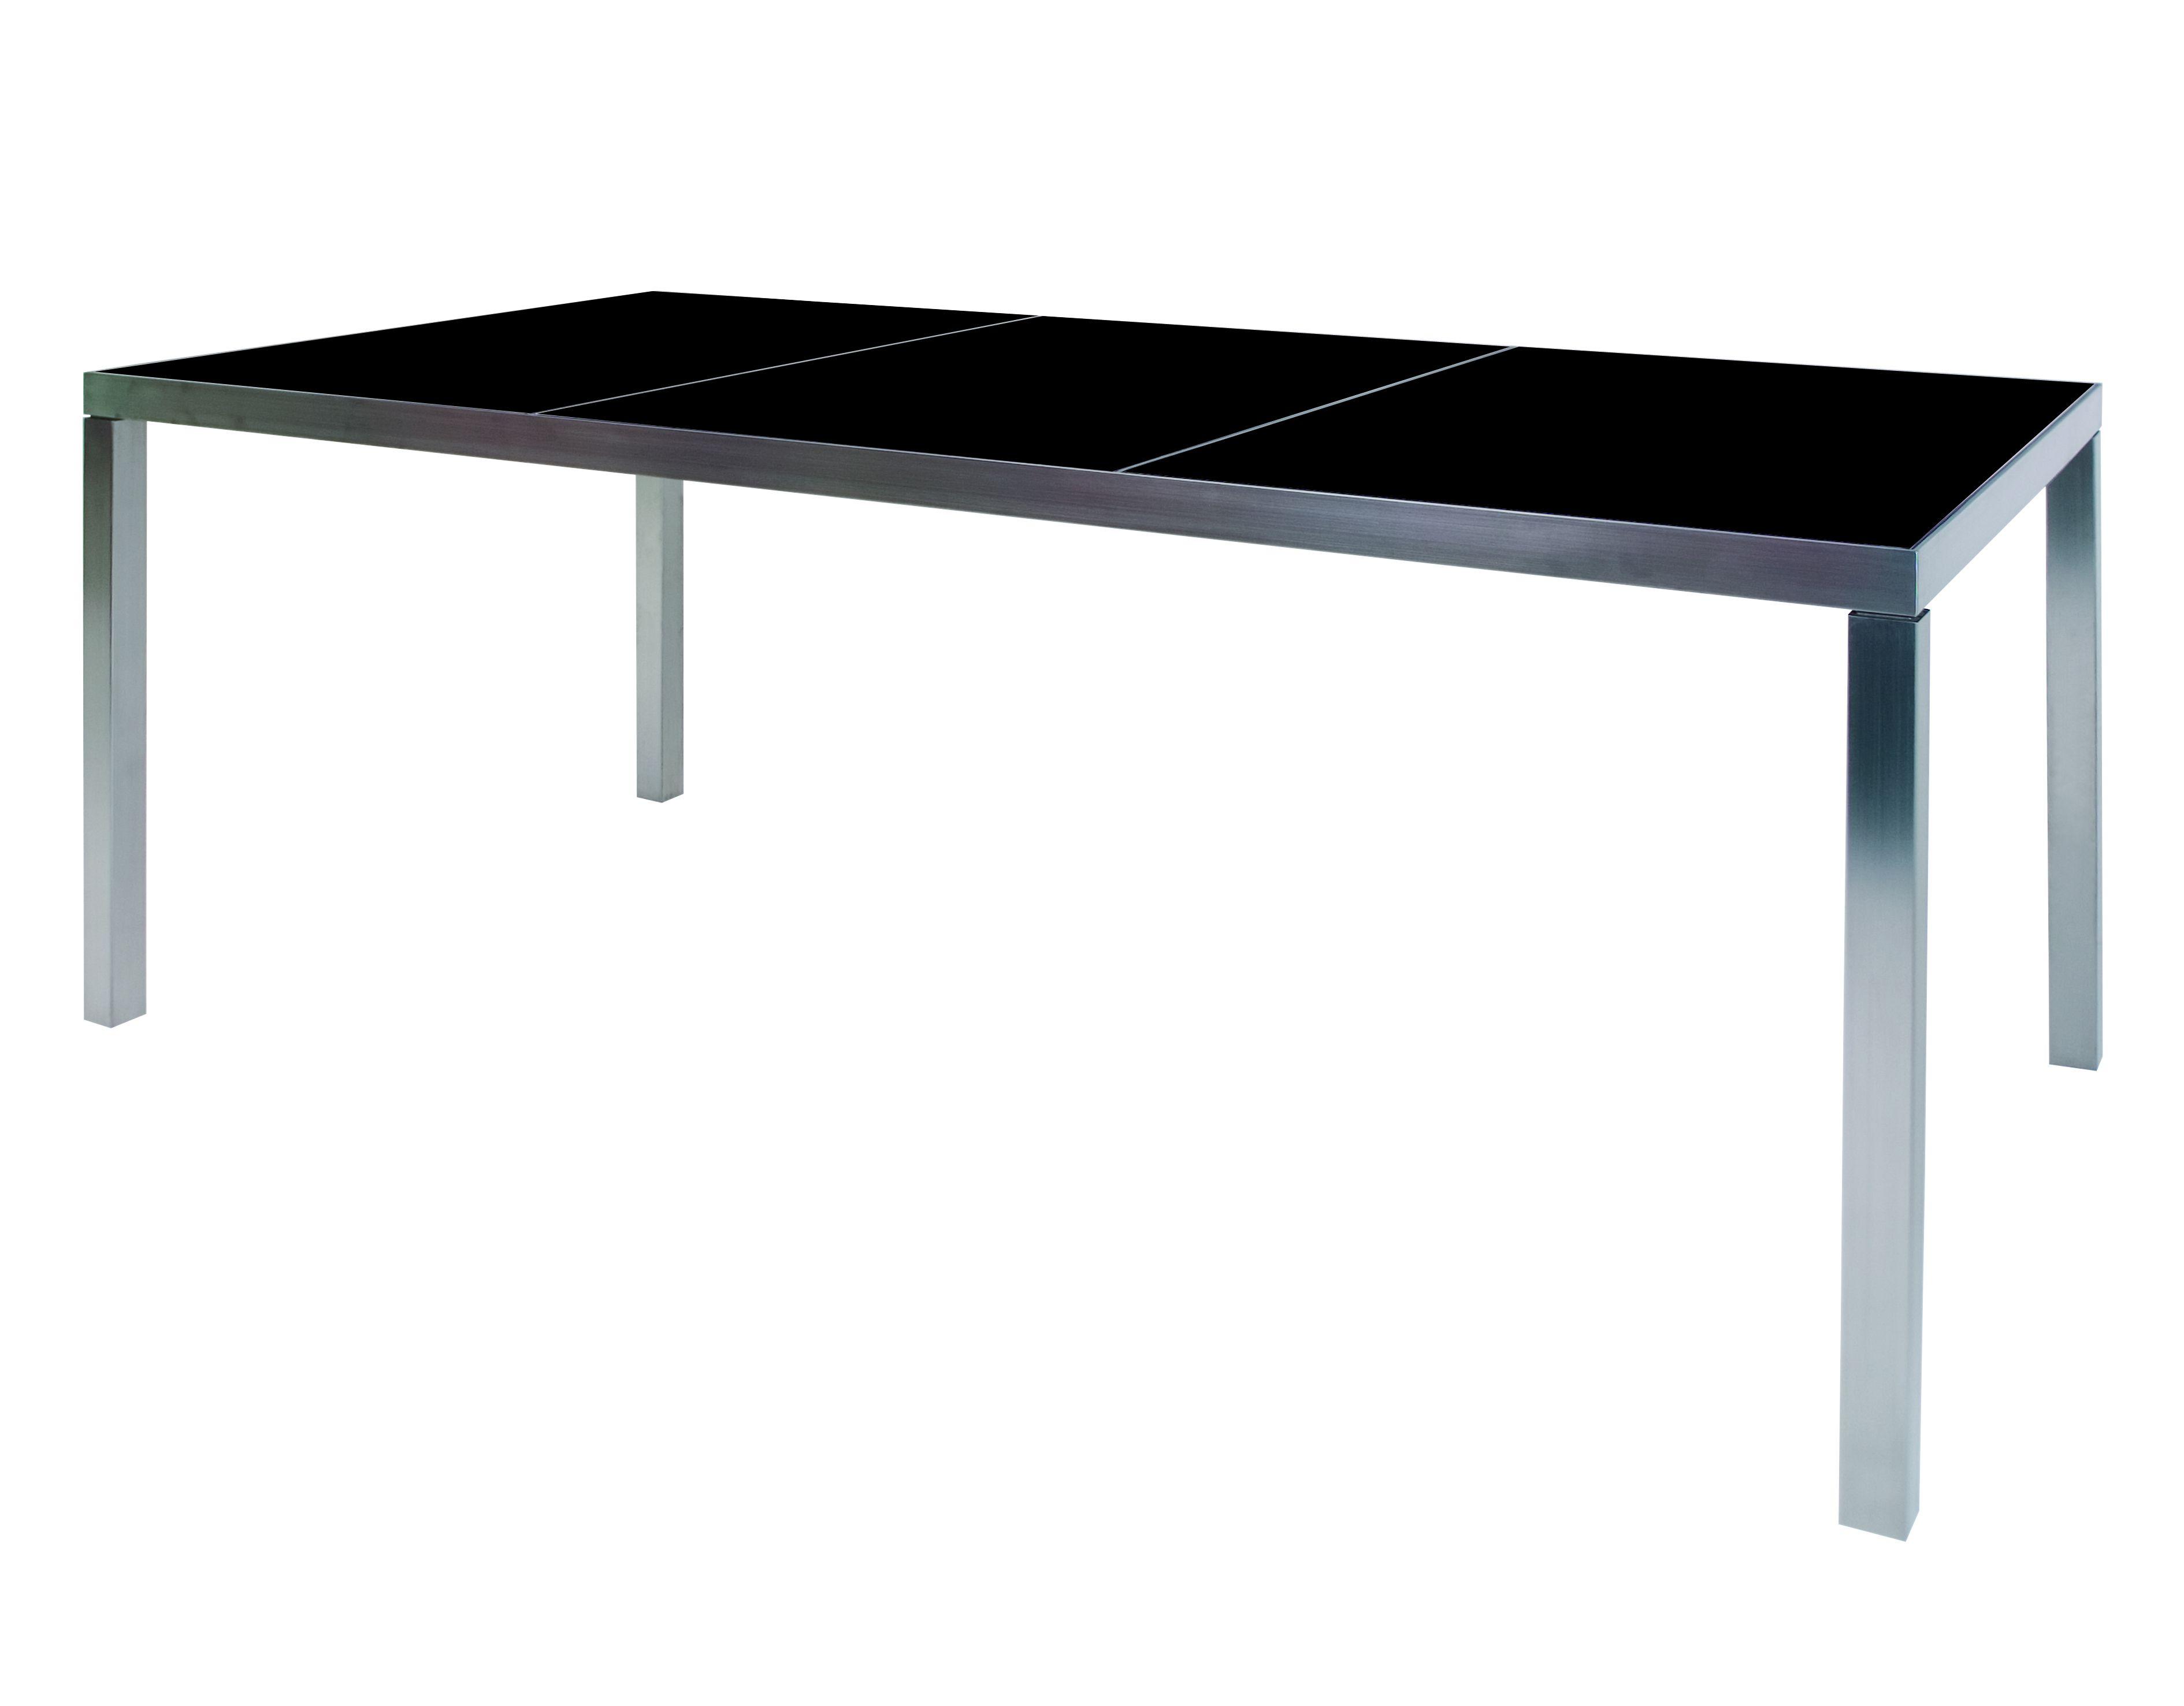 Table de jardin rectangulaire en acier inoxydable sexion - Table en acier inoxydable ...